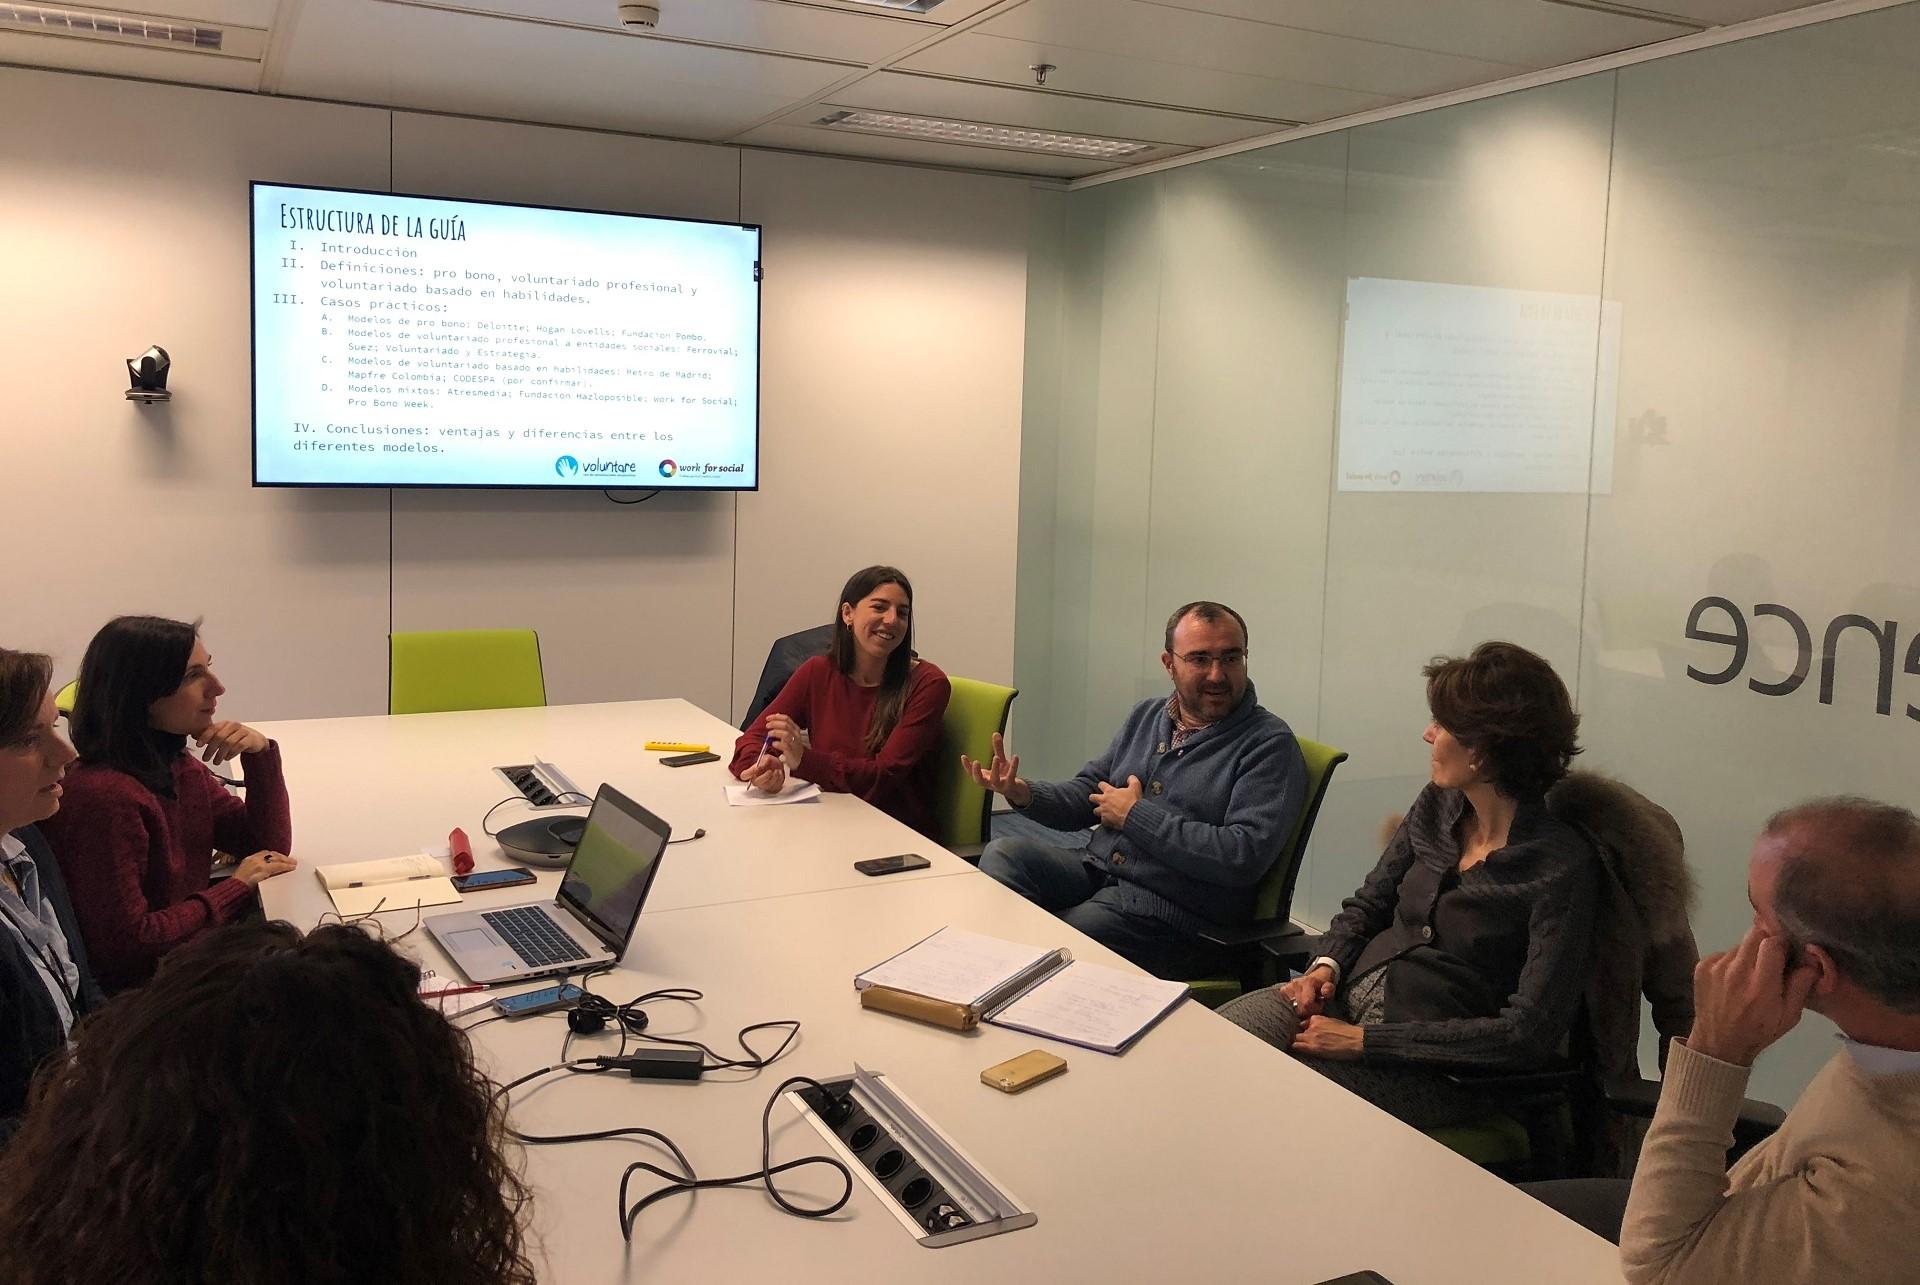 reunion grupo trabajo voluntare voluntariado corporativo pro bono